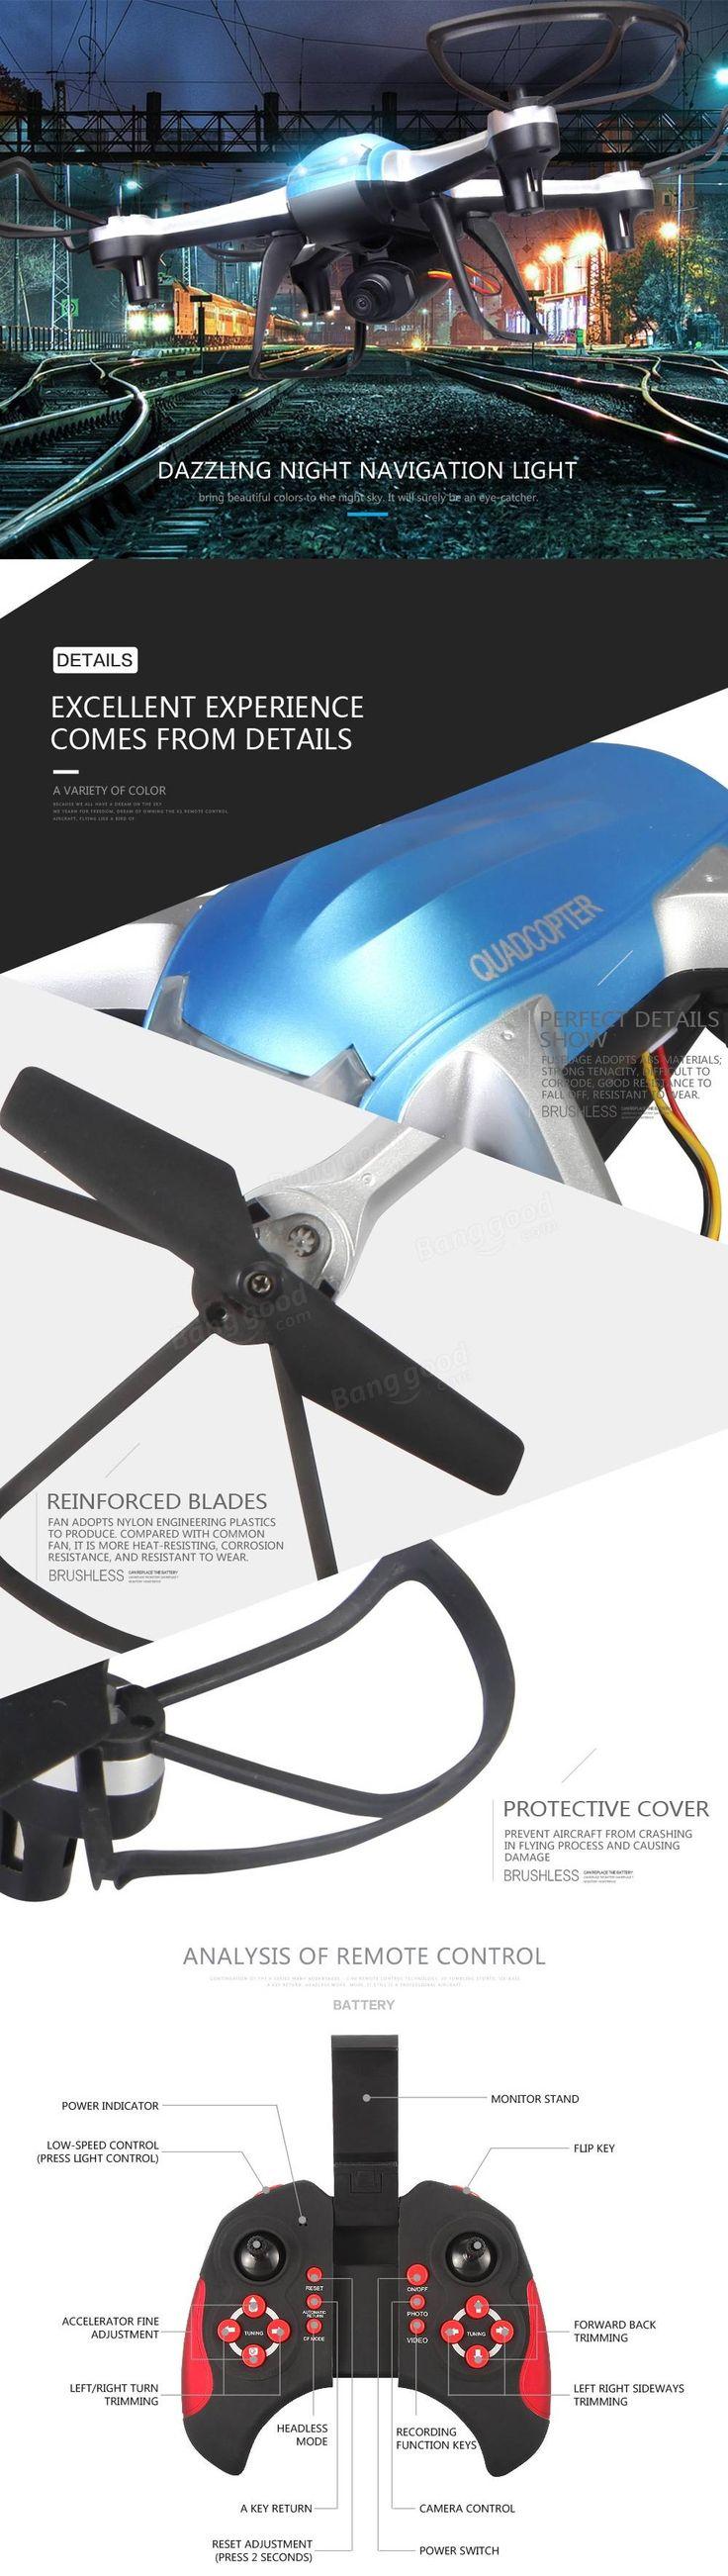 Eachine H99D 3MP 120° Wide-Angle HD Camera 2.4G 6 Axis Headless Mode RC Quadcopter RTF Sale - Banggood.com